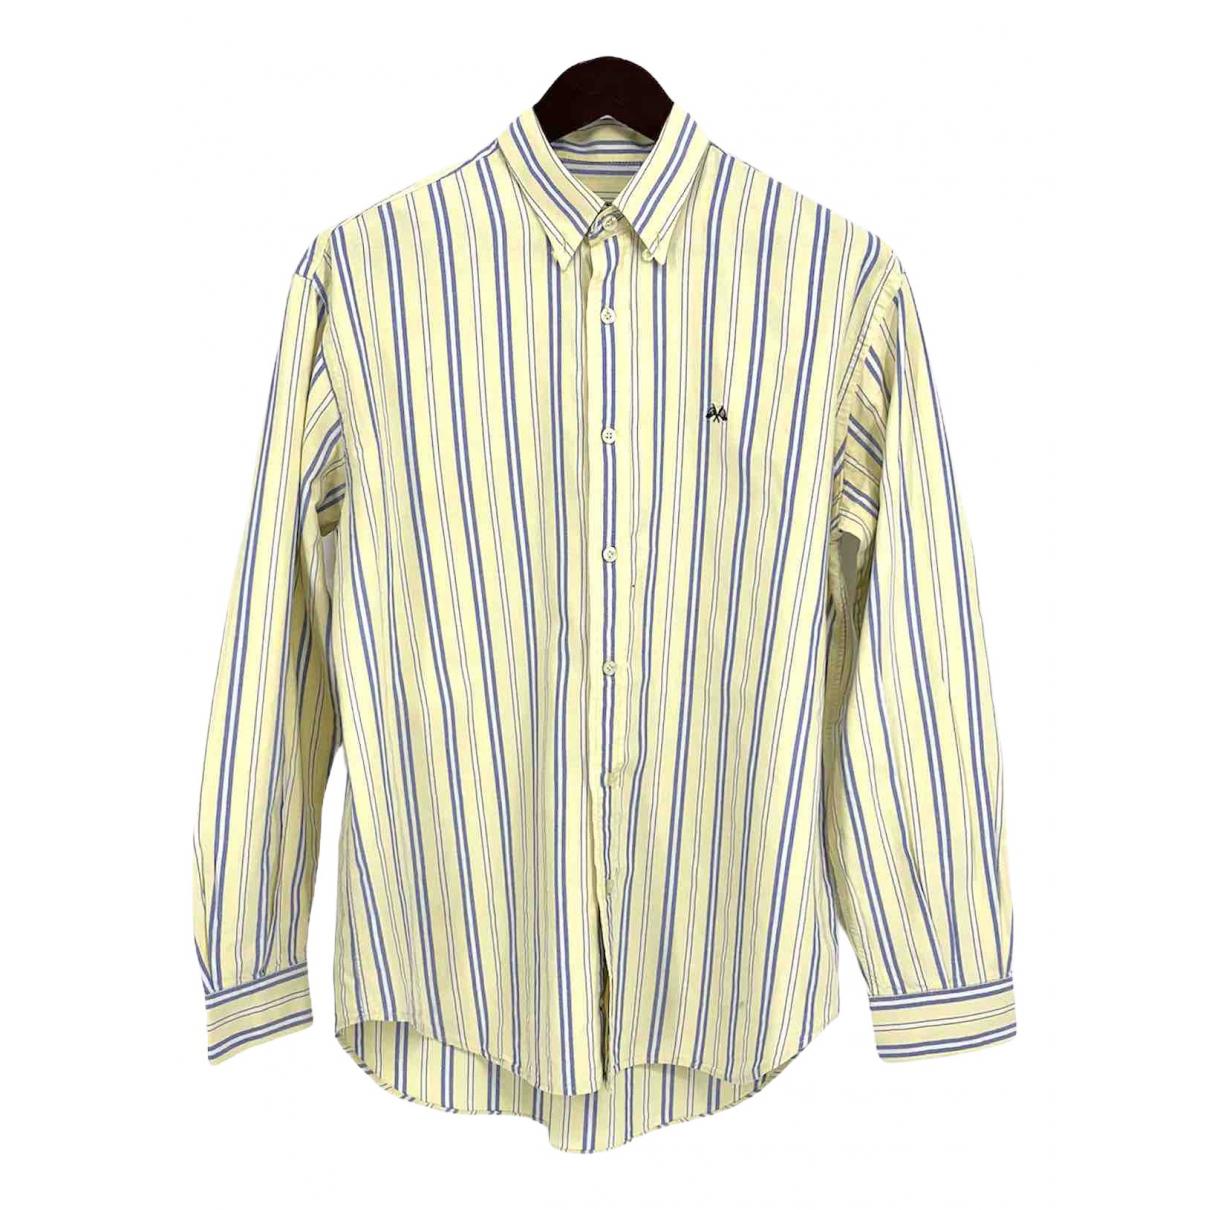 Burberry N Multicolour Cotton Shirts for Men L International